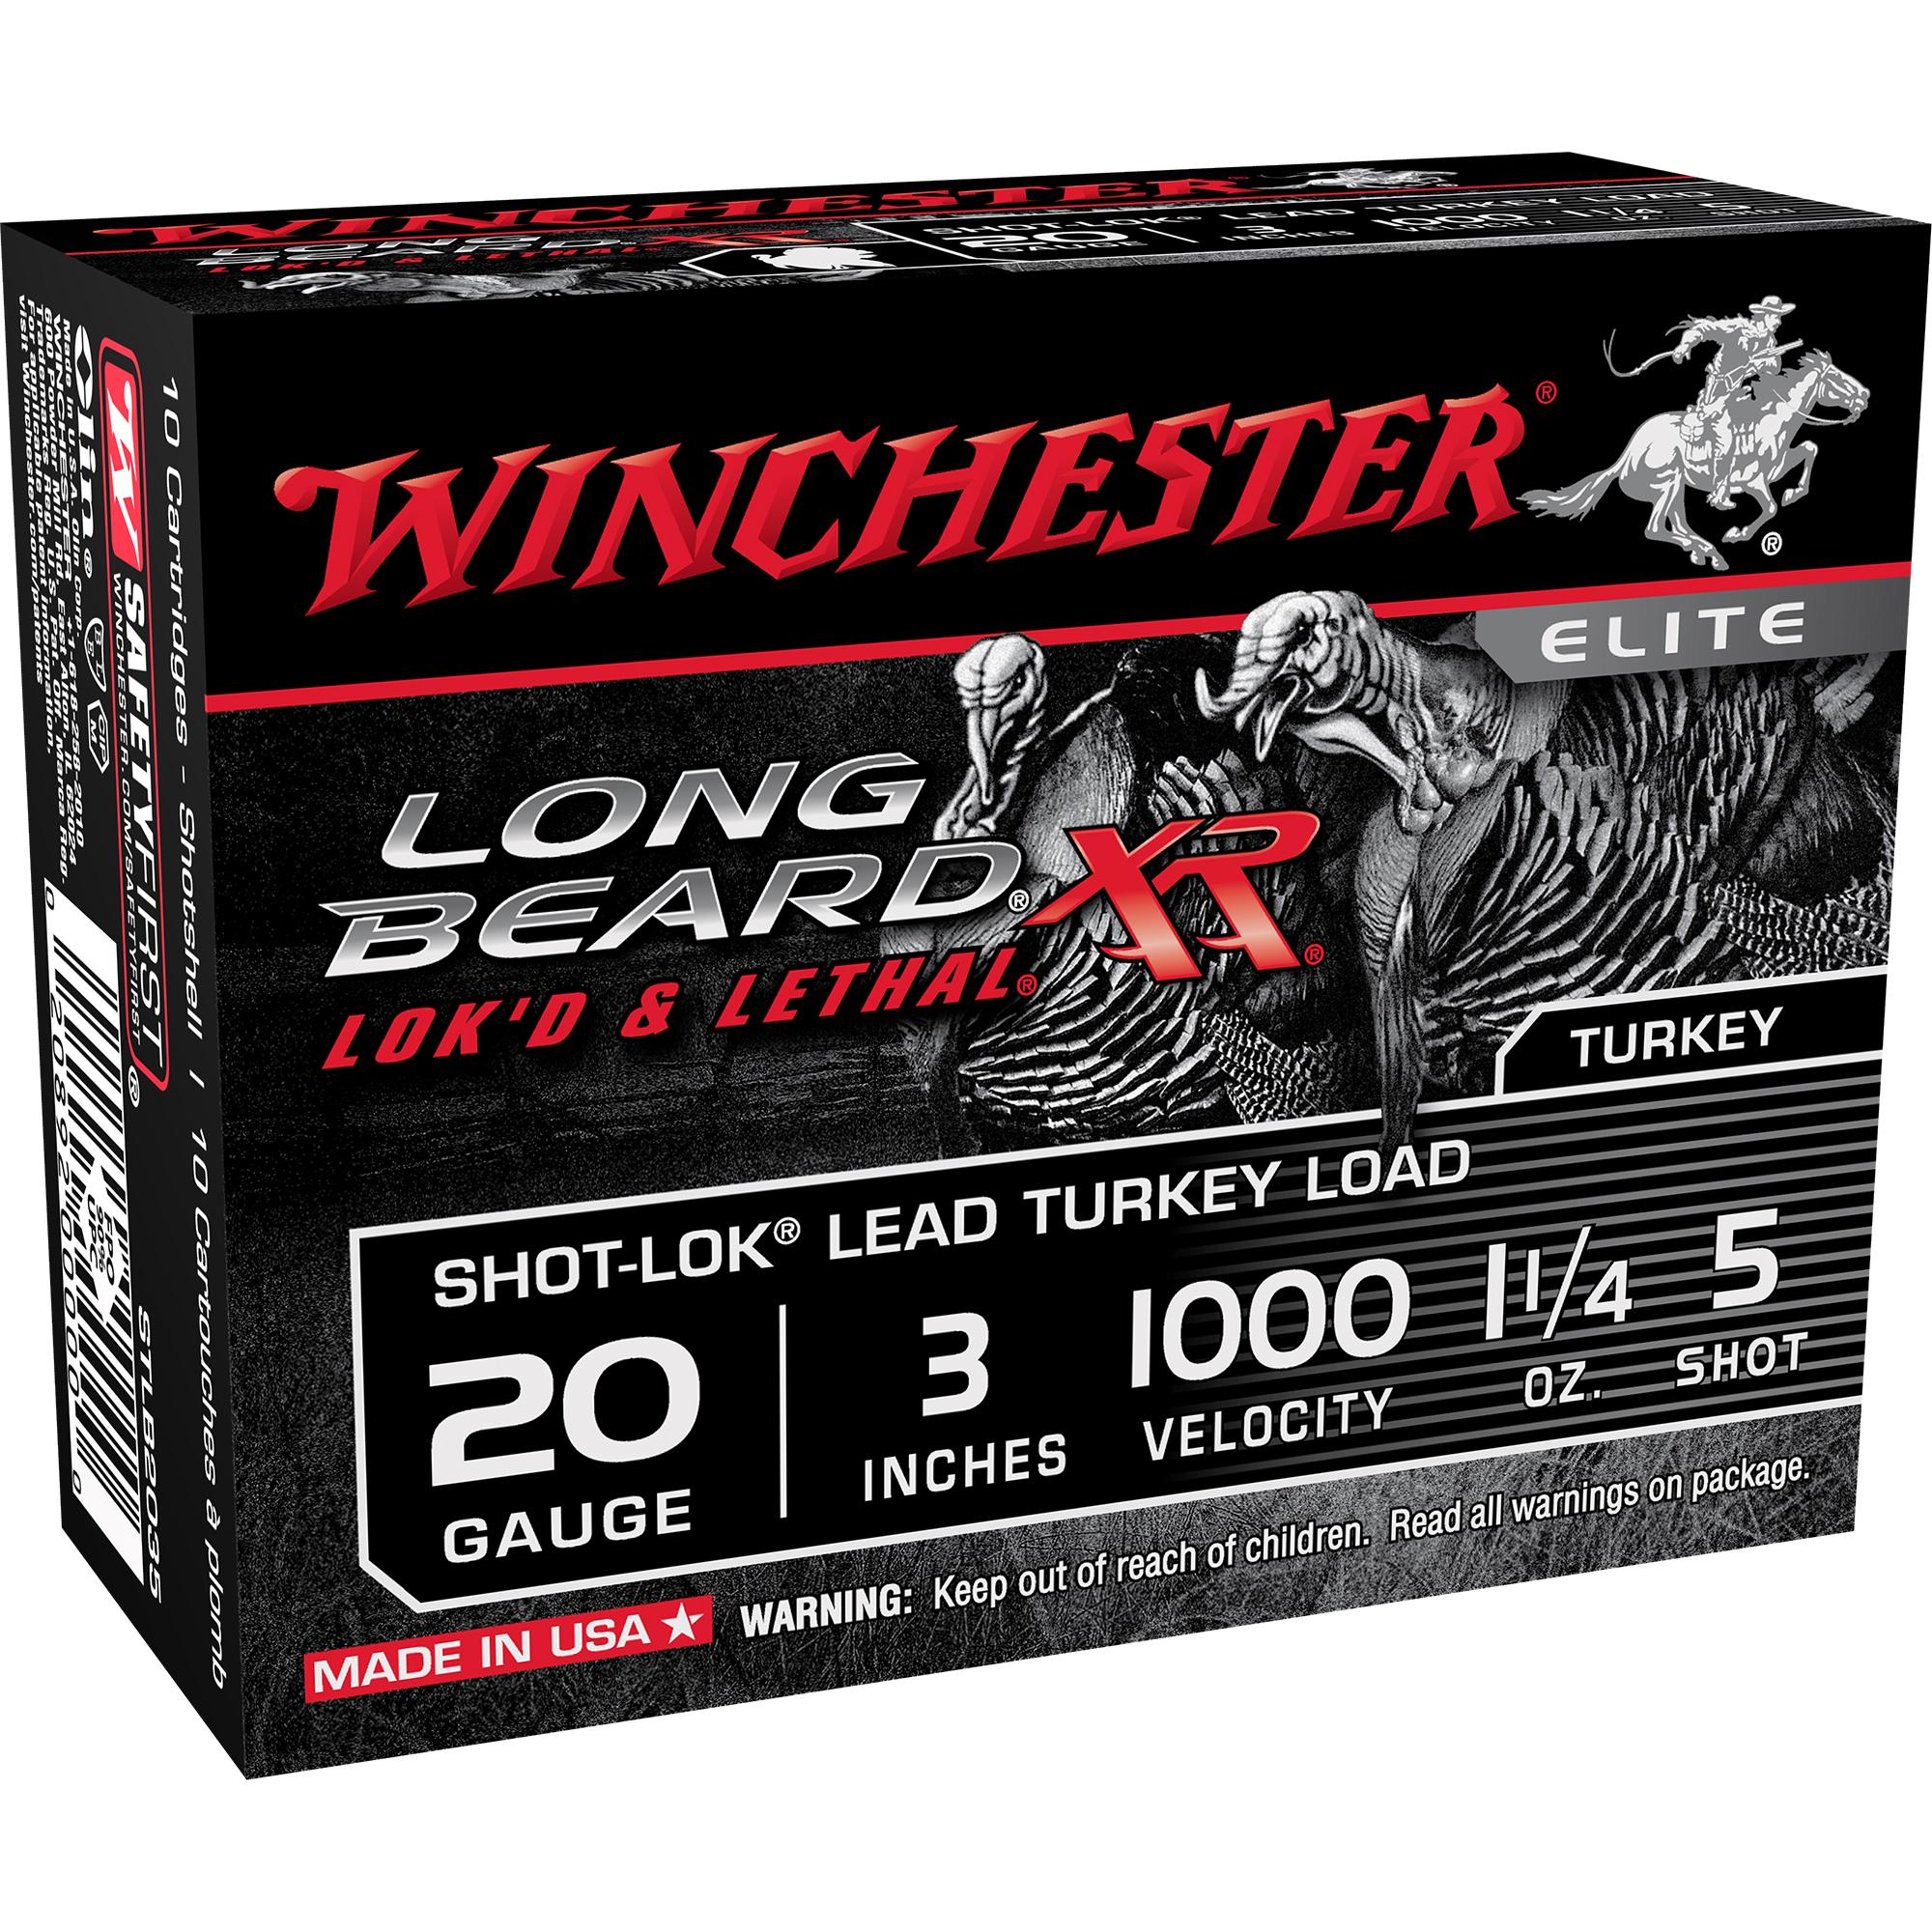 Winchester Long Beard XR Turkey Loads, 20-ga, 3″, 1-1/4 oz, #5